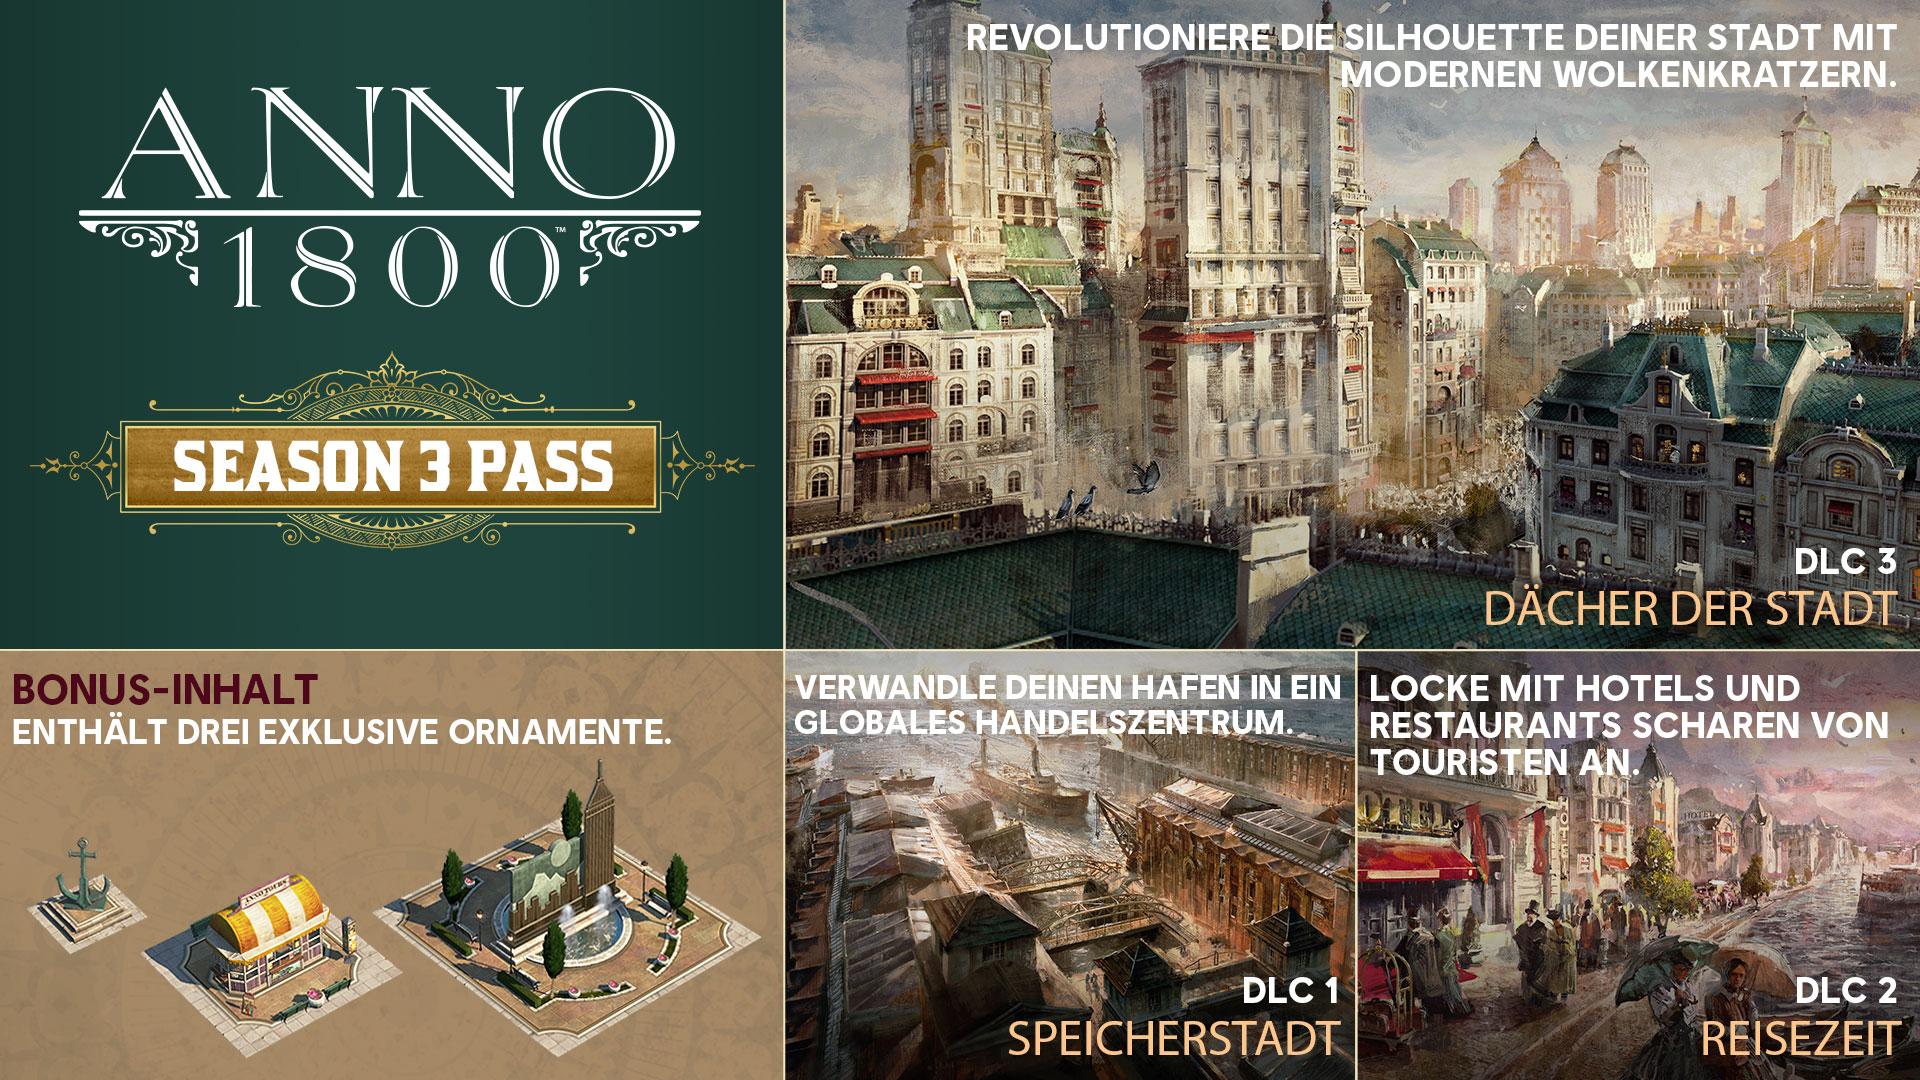 Anno 1800 Season 3 Pass